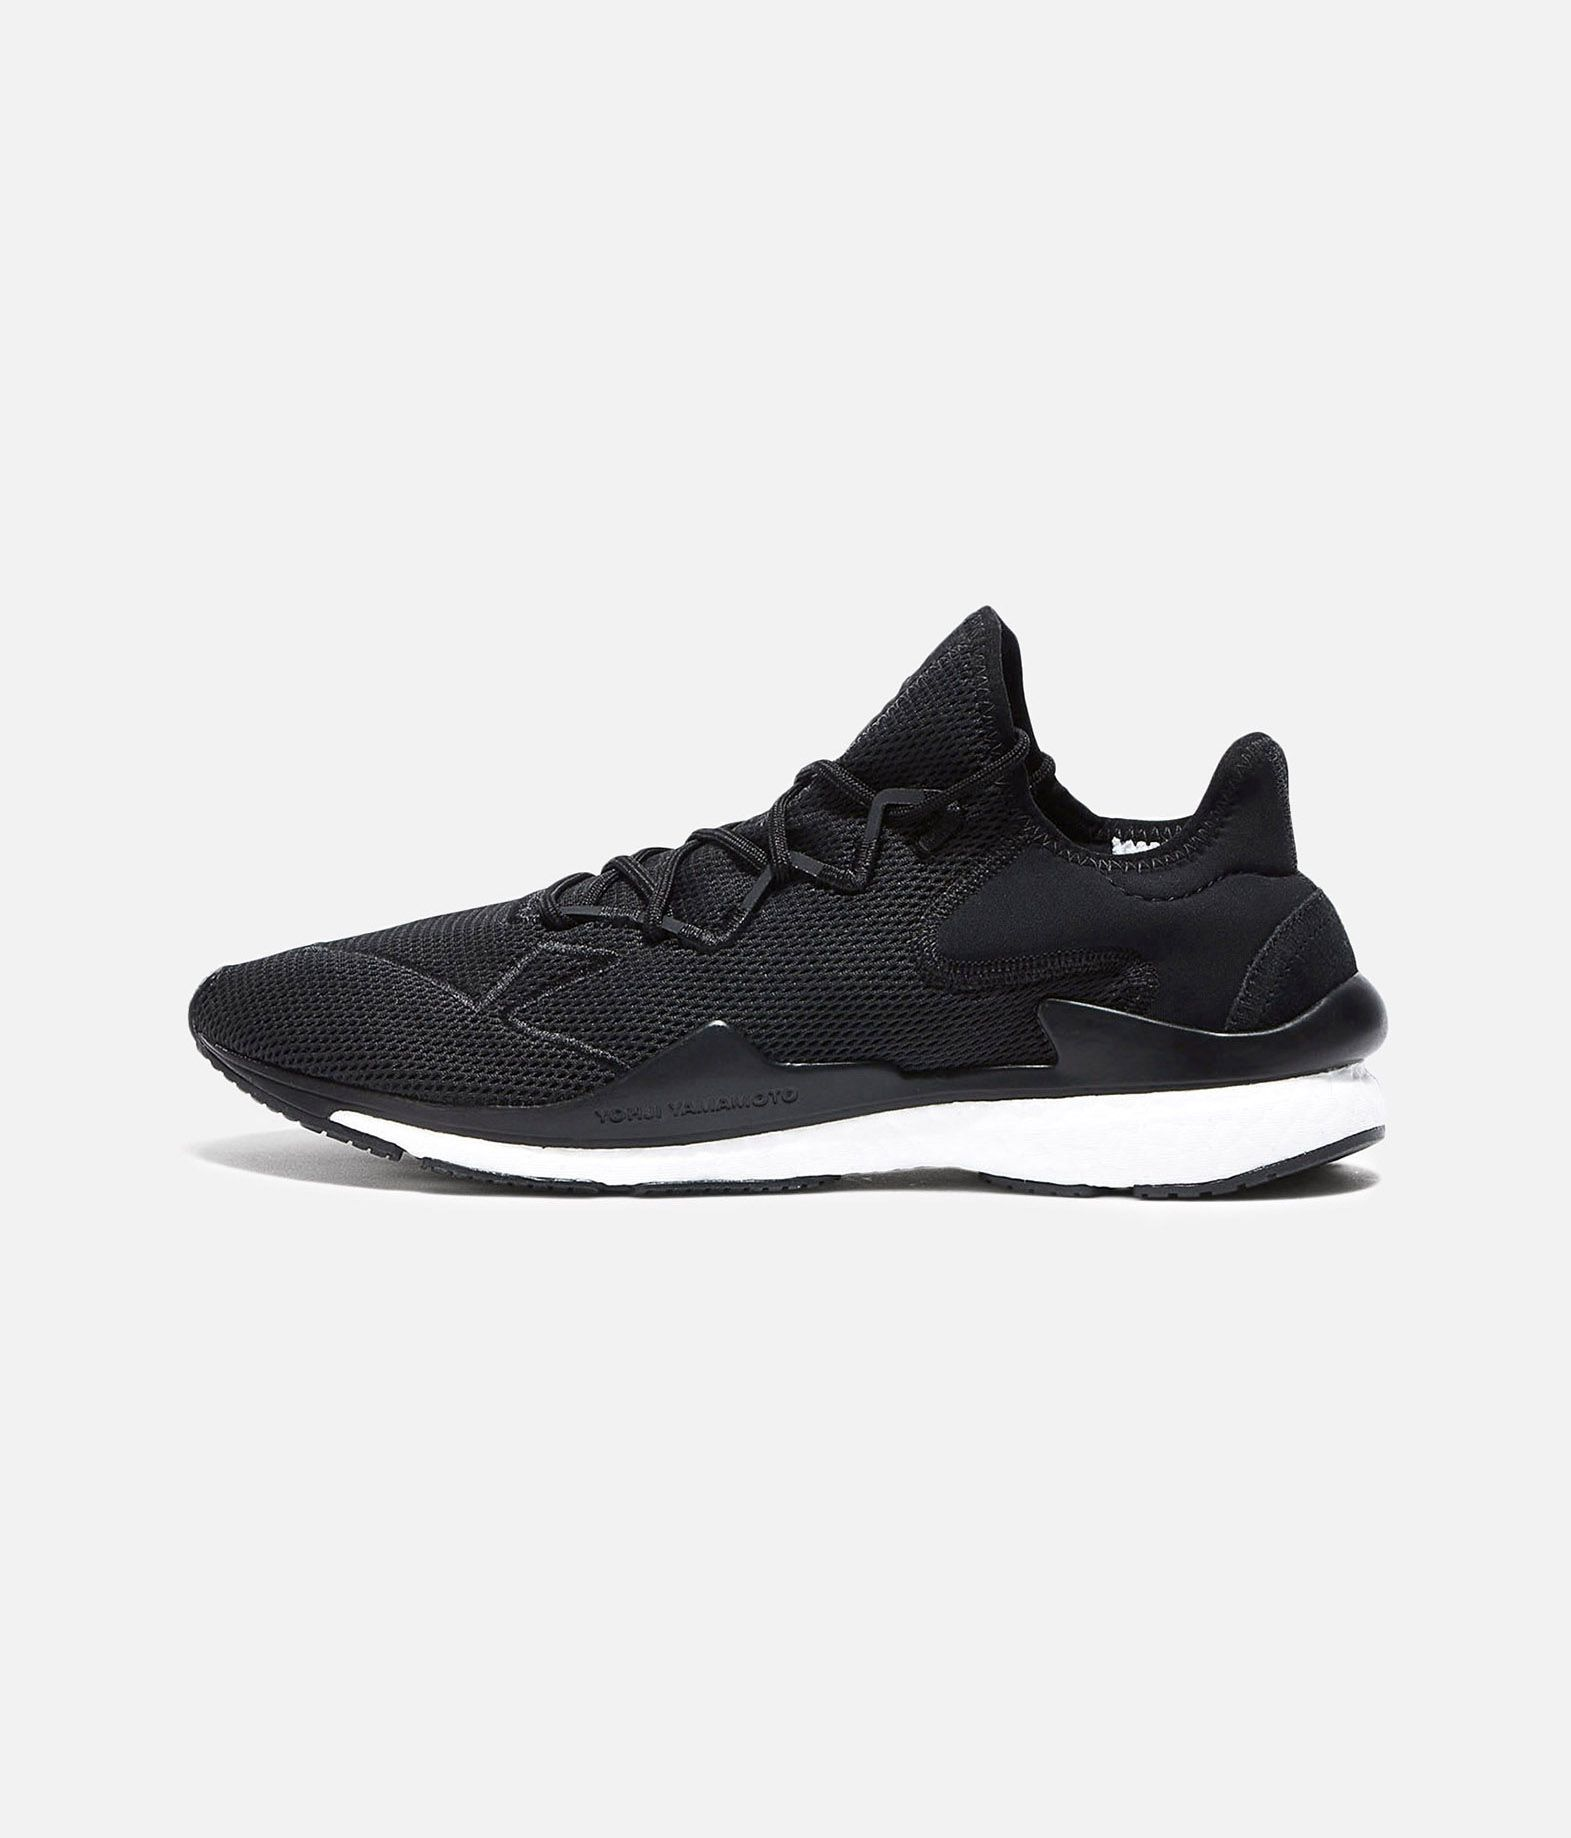 ... Y-3 Y-3 Adizero Runner Sneakers E f ... c2f8717bf